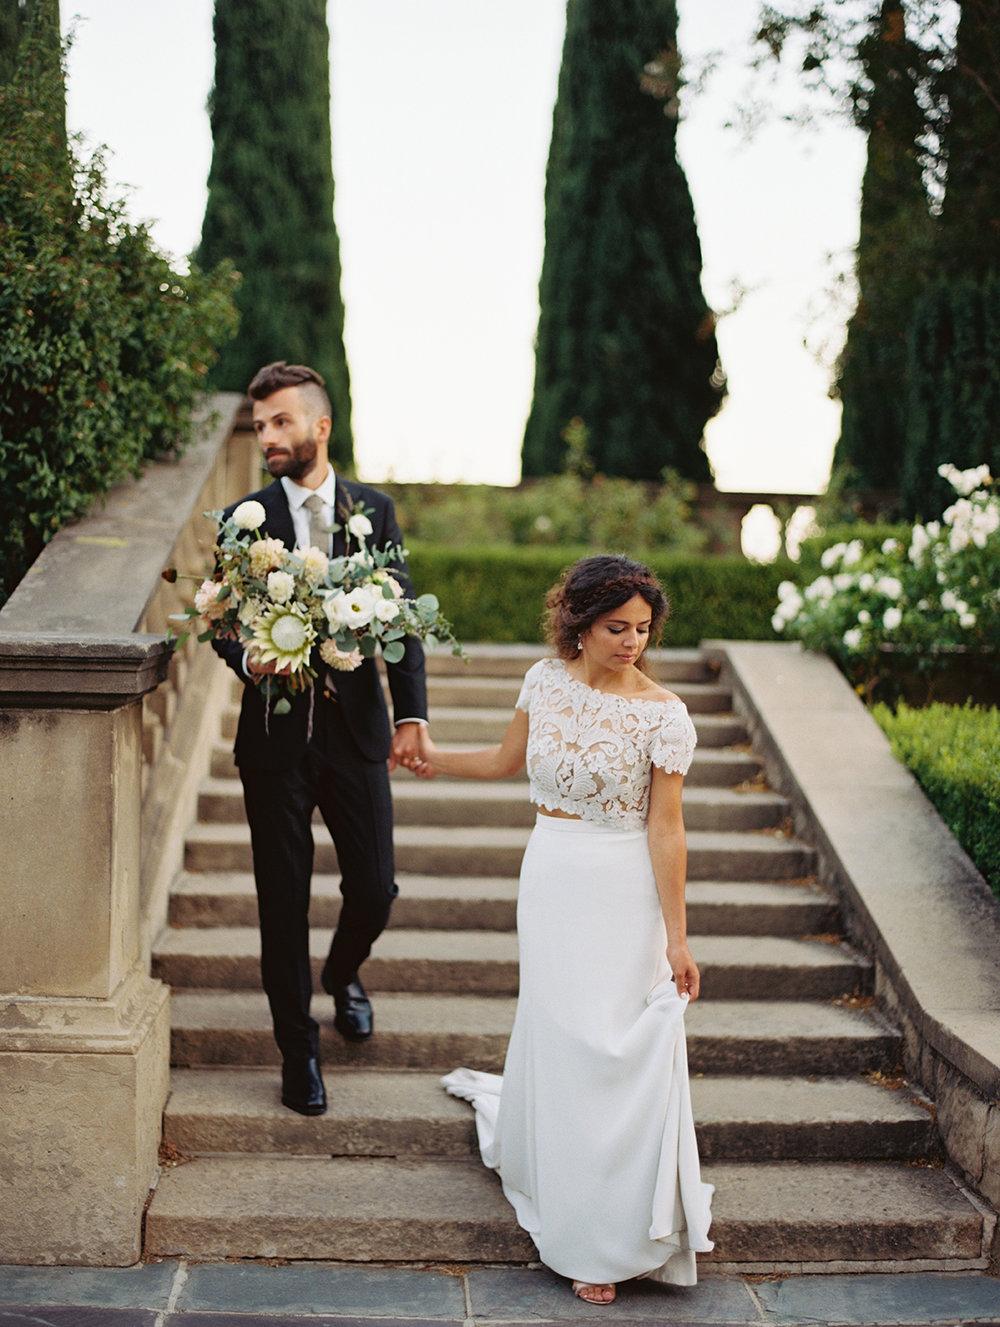 319-brian-sarra-los-angeles-wedding-brumley-wells-photography.jpg